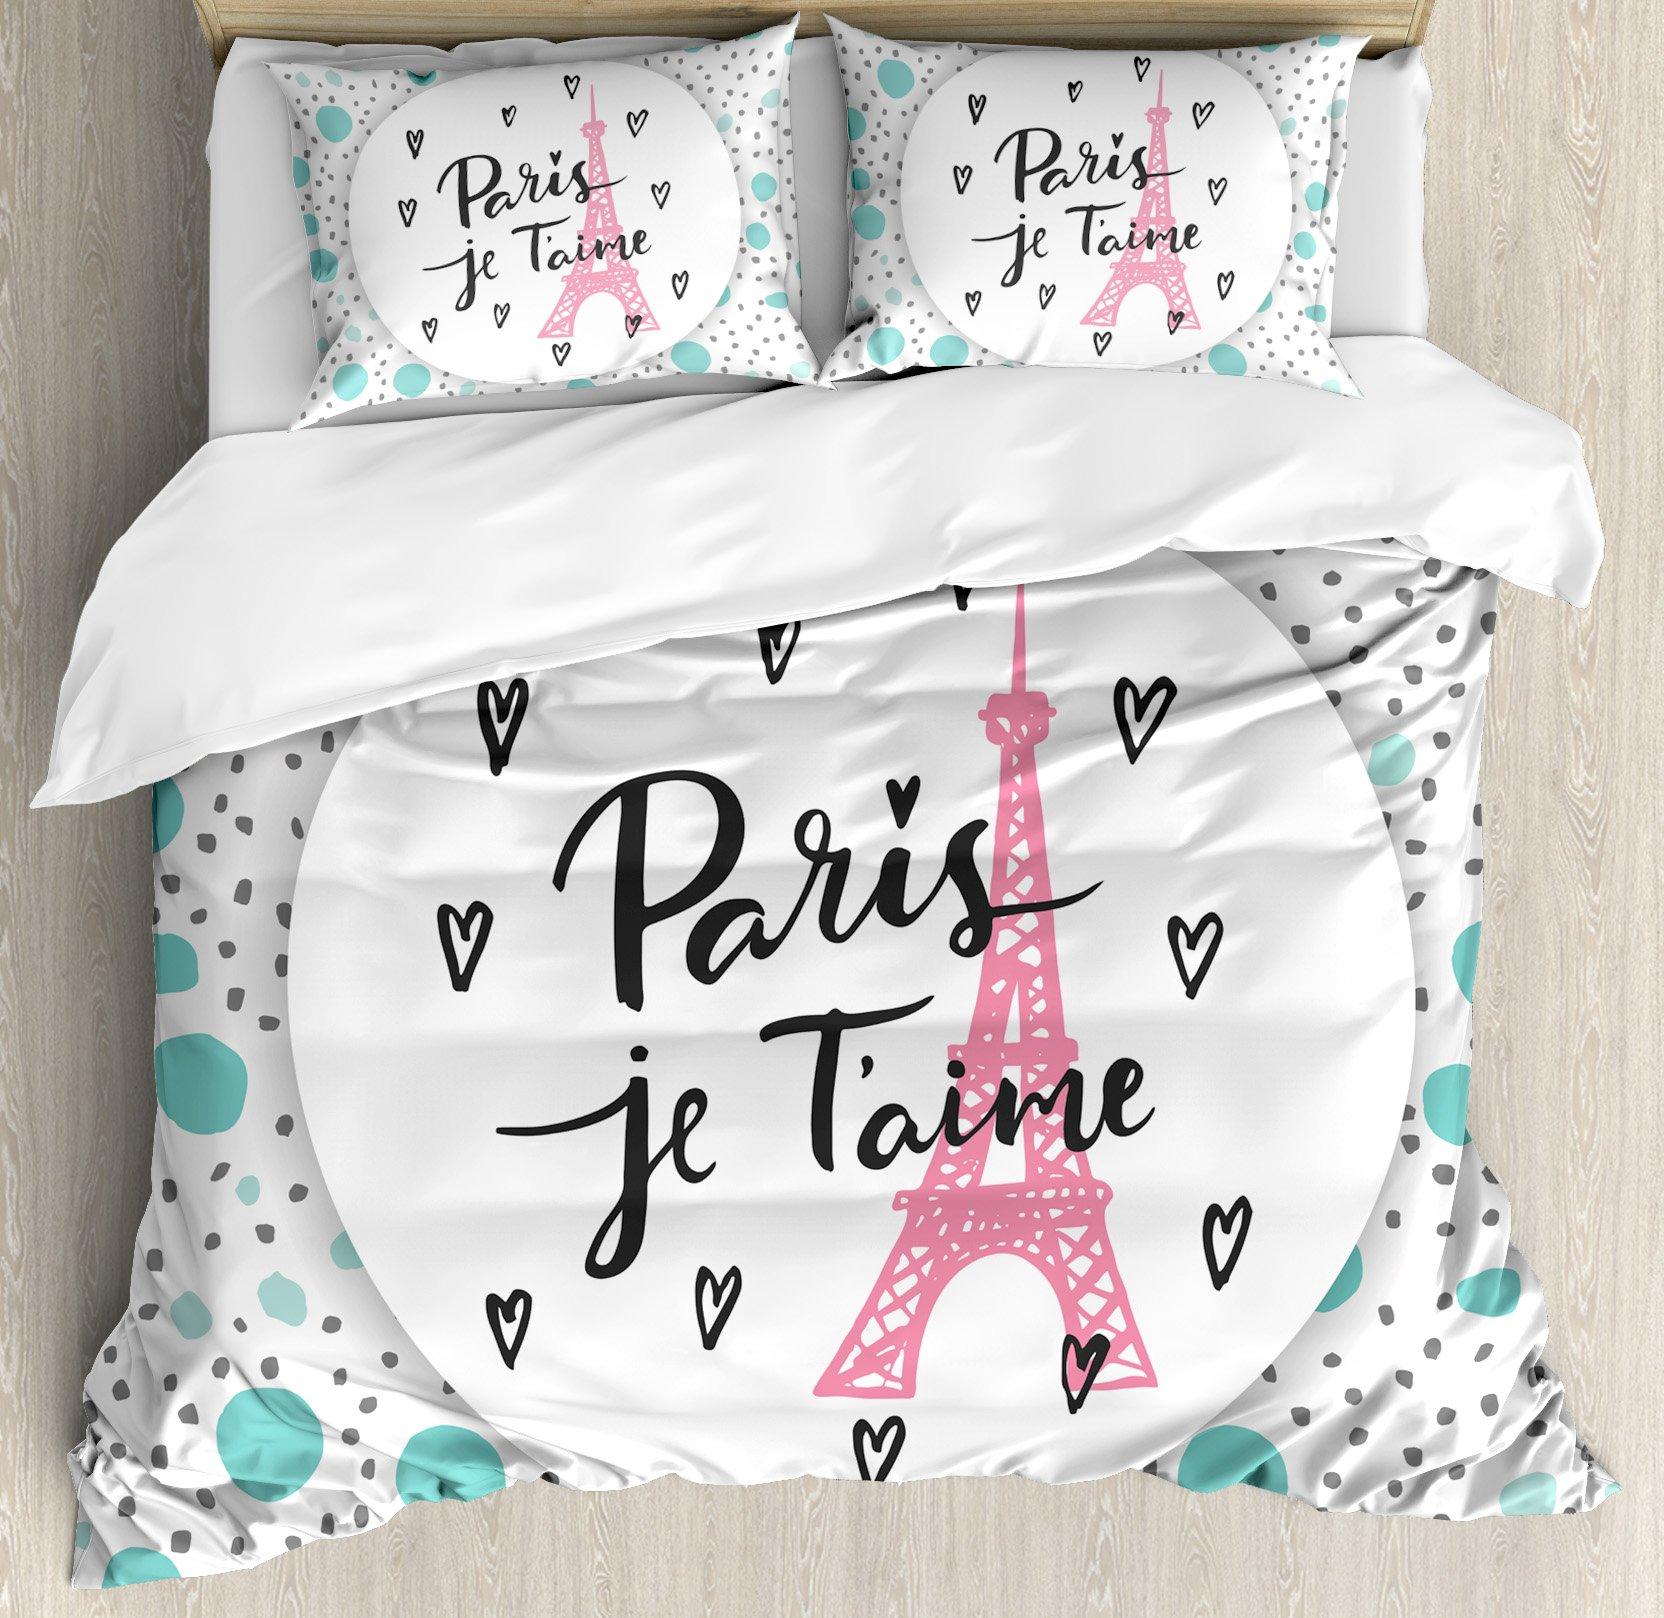 Paris City Decor King Size Duvet Cover Set by Ambesonne, Paris, I Love You Lettering Fashion Modern Background Europe Architecture Symbol, Decorative 3 Piece Bedding Set with 2 Pillow Shams